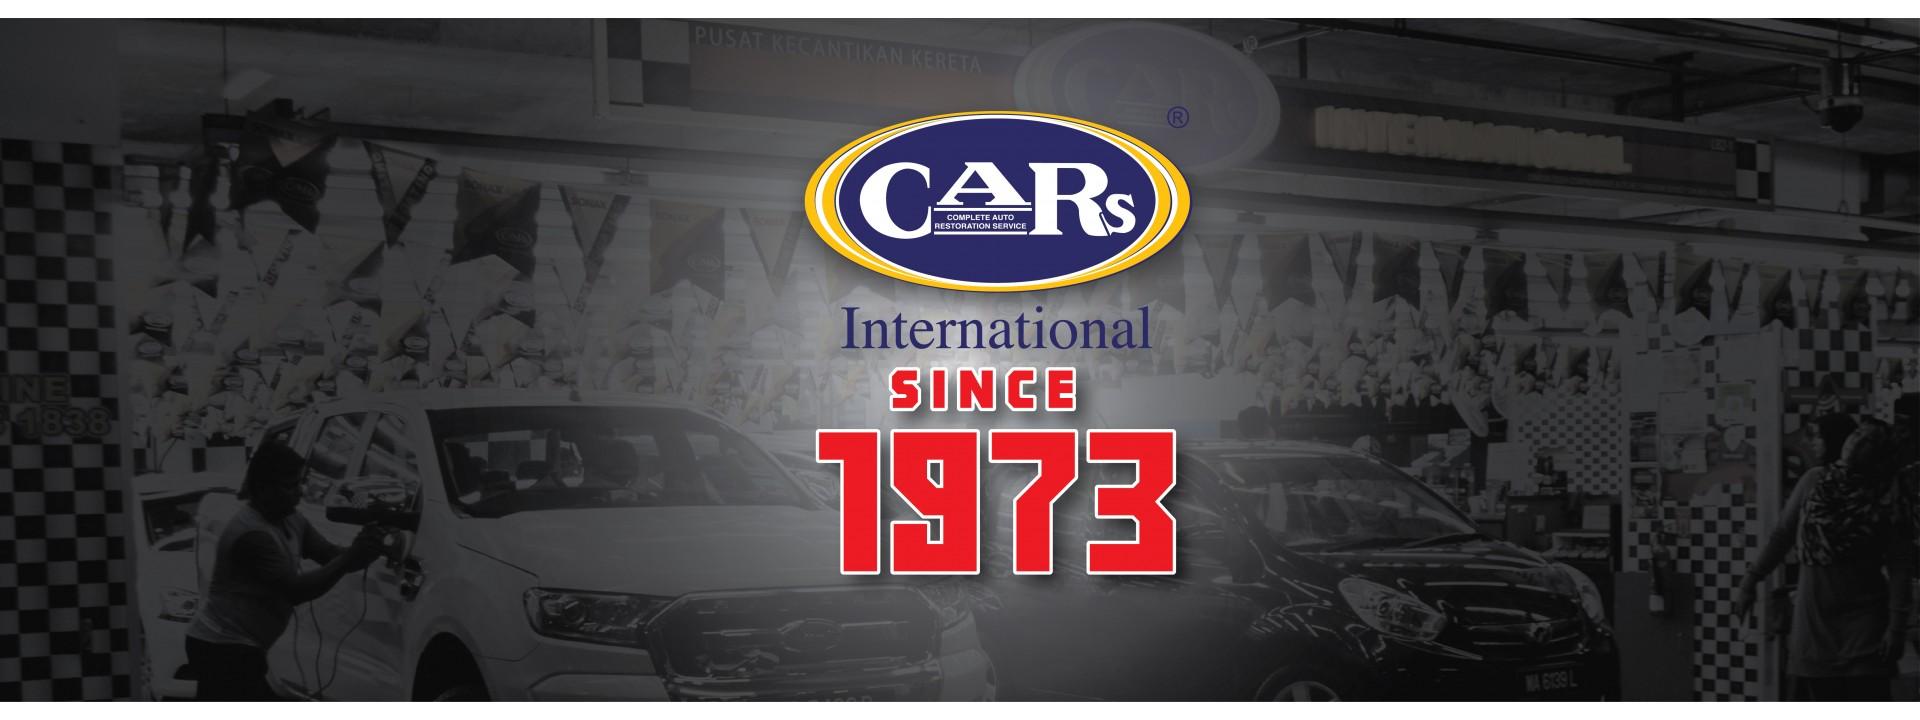 CARs International - Cars international